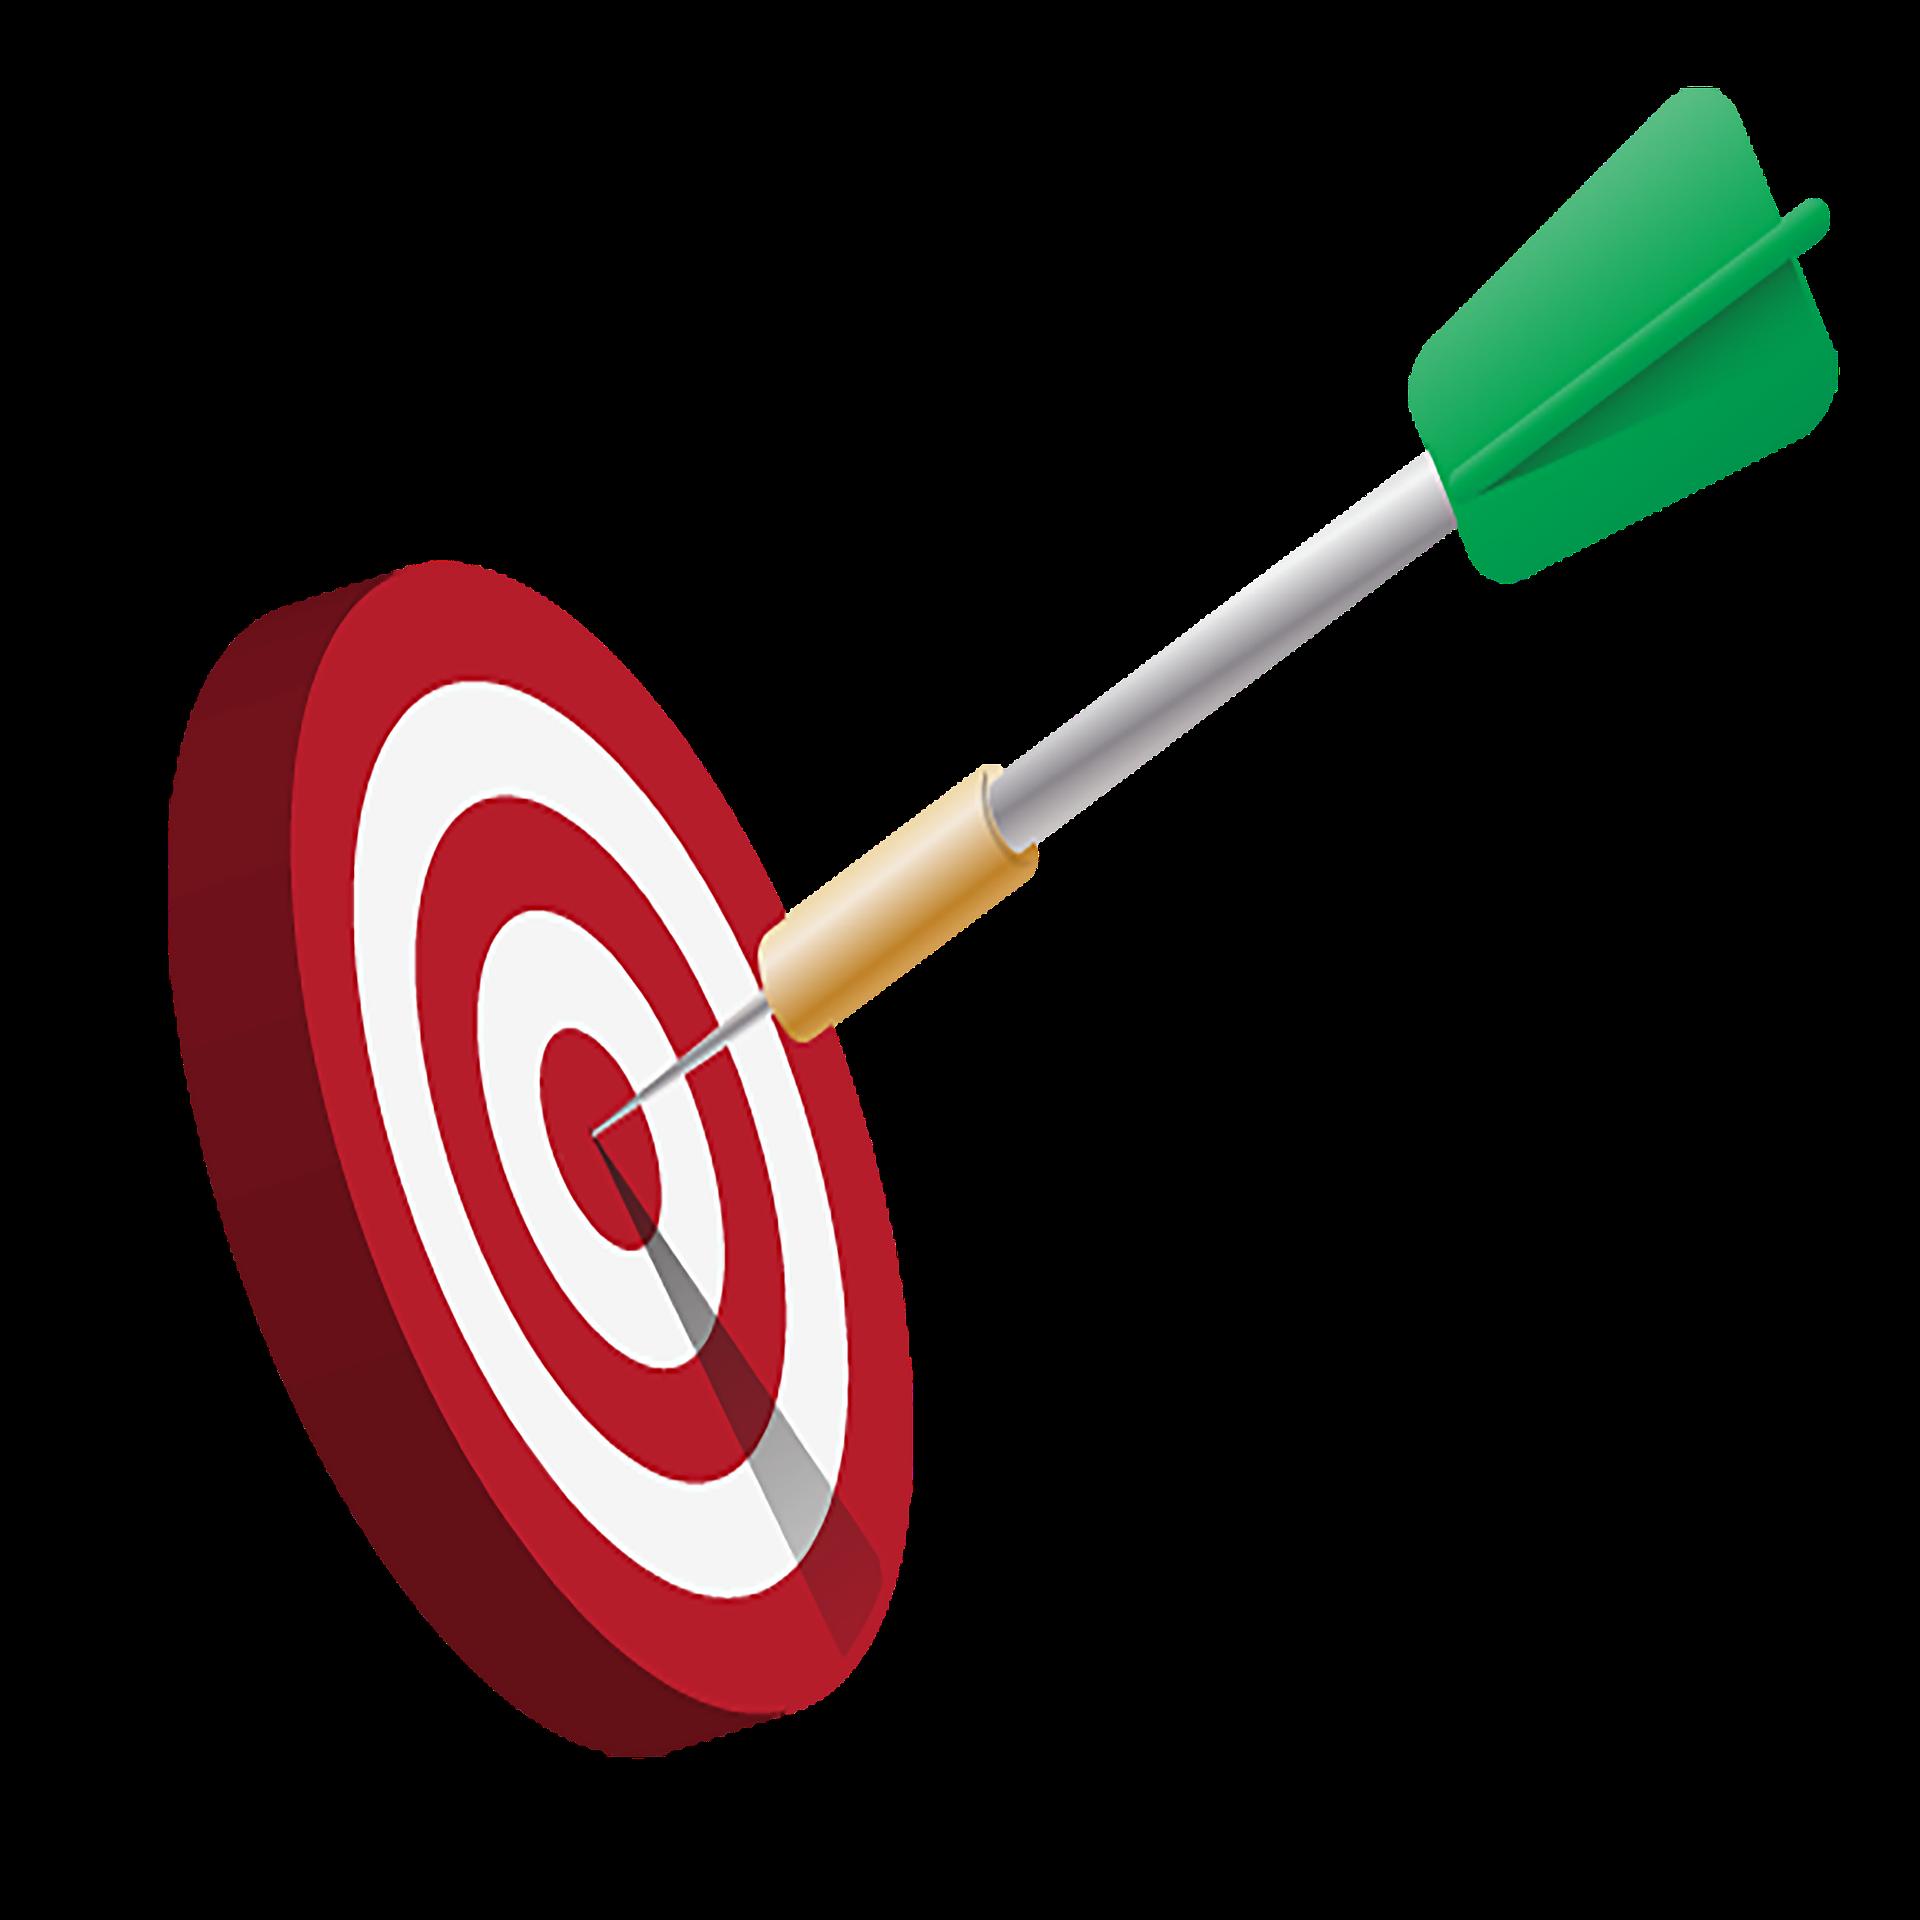 target-1414788_1920.png